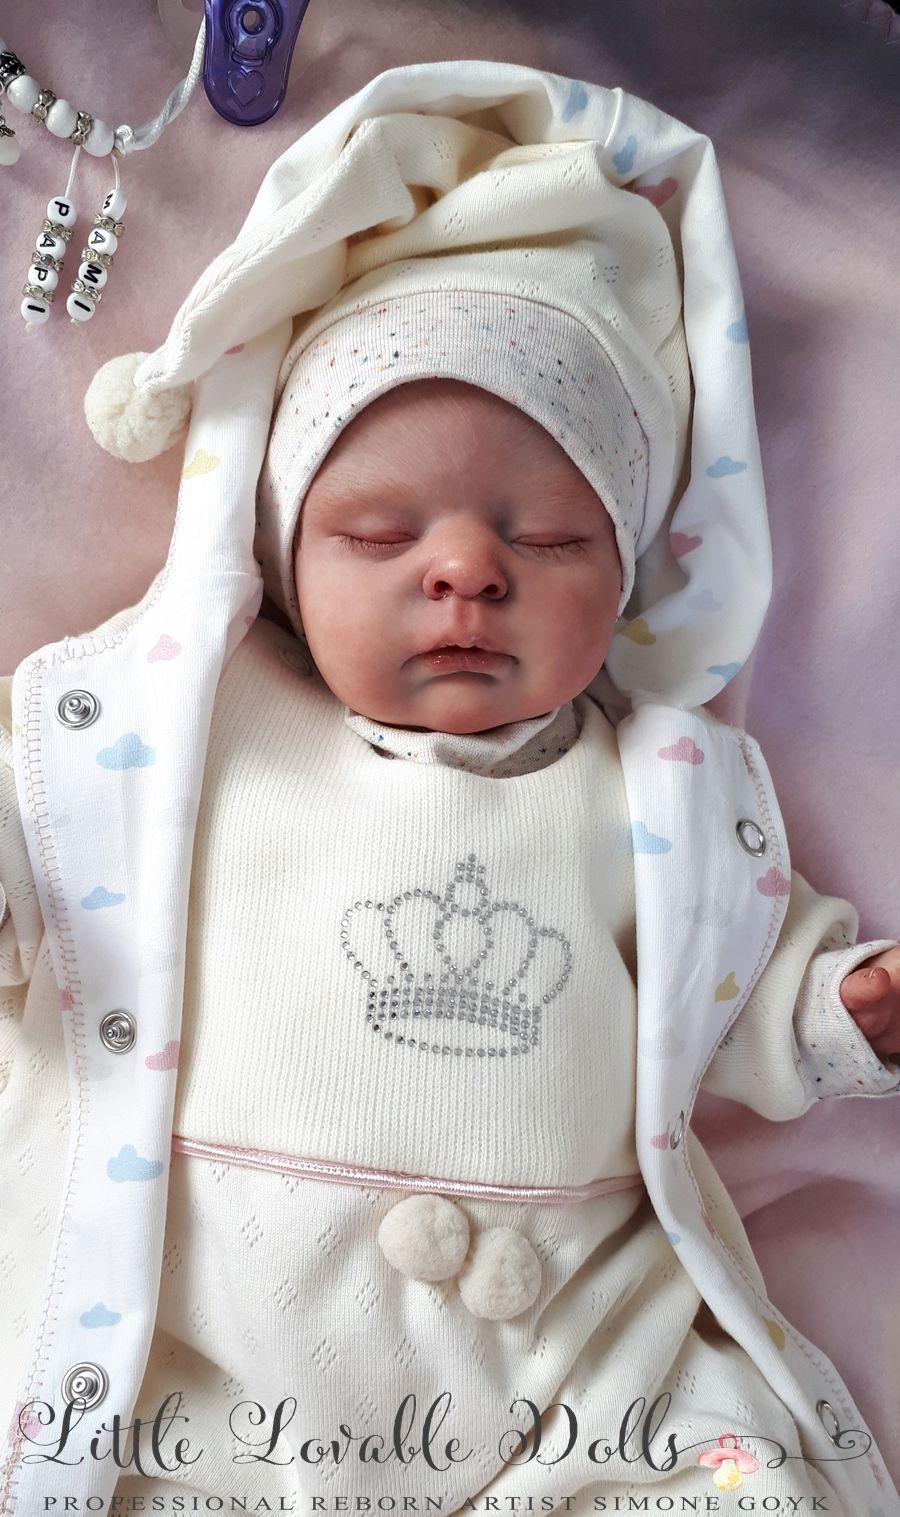 Reborn Baby Puppe Zoey Bausatz Cassie Brace Reborn Babies Baby Dolls Baby Onesies